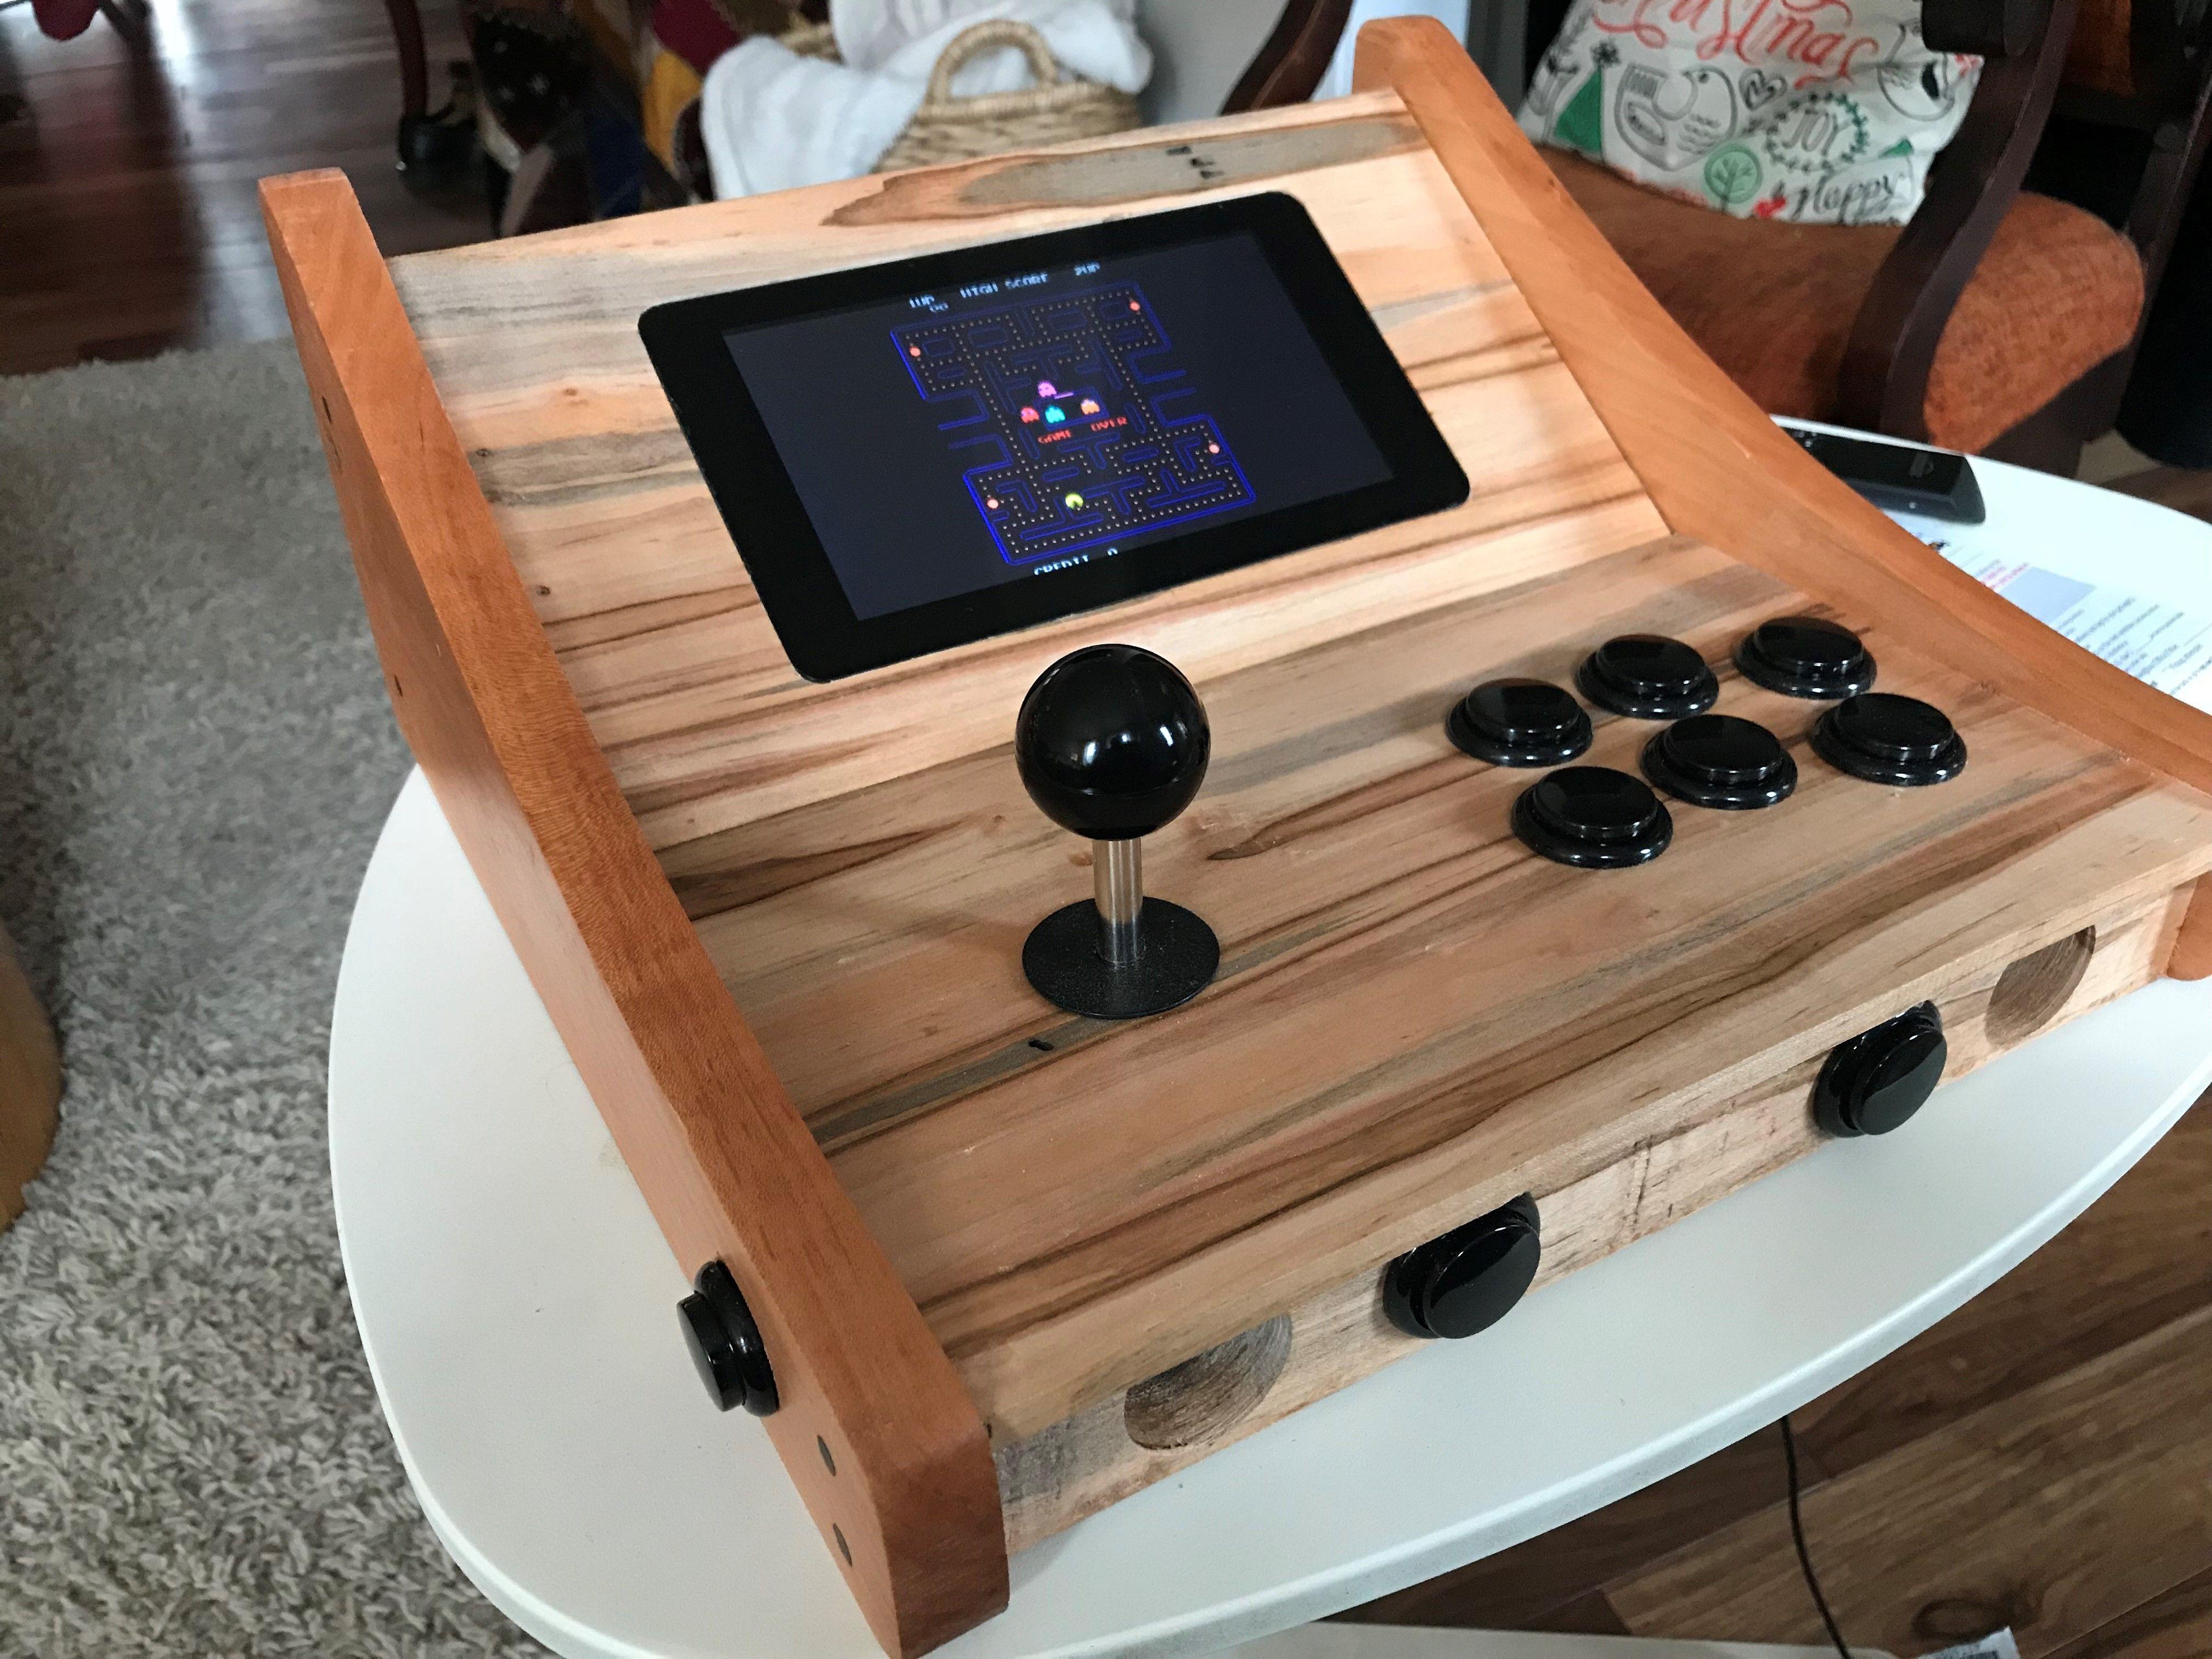 New Retropie Tabletop Arcade Retropie